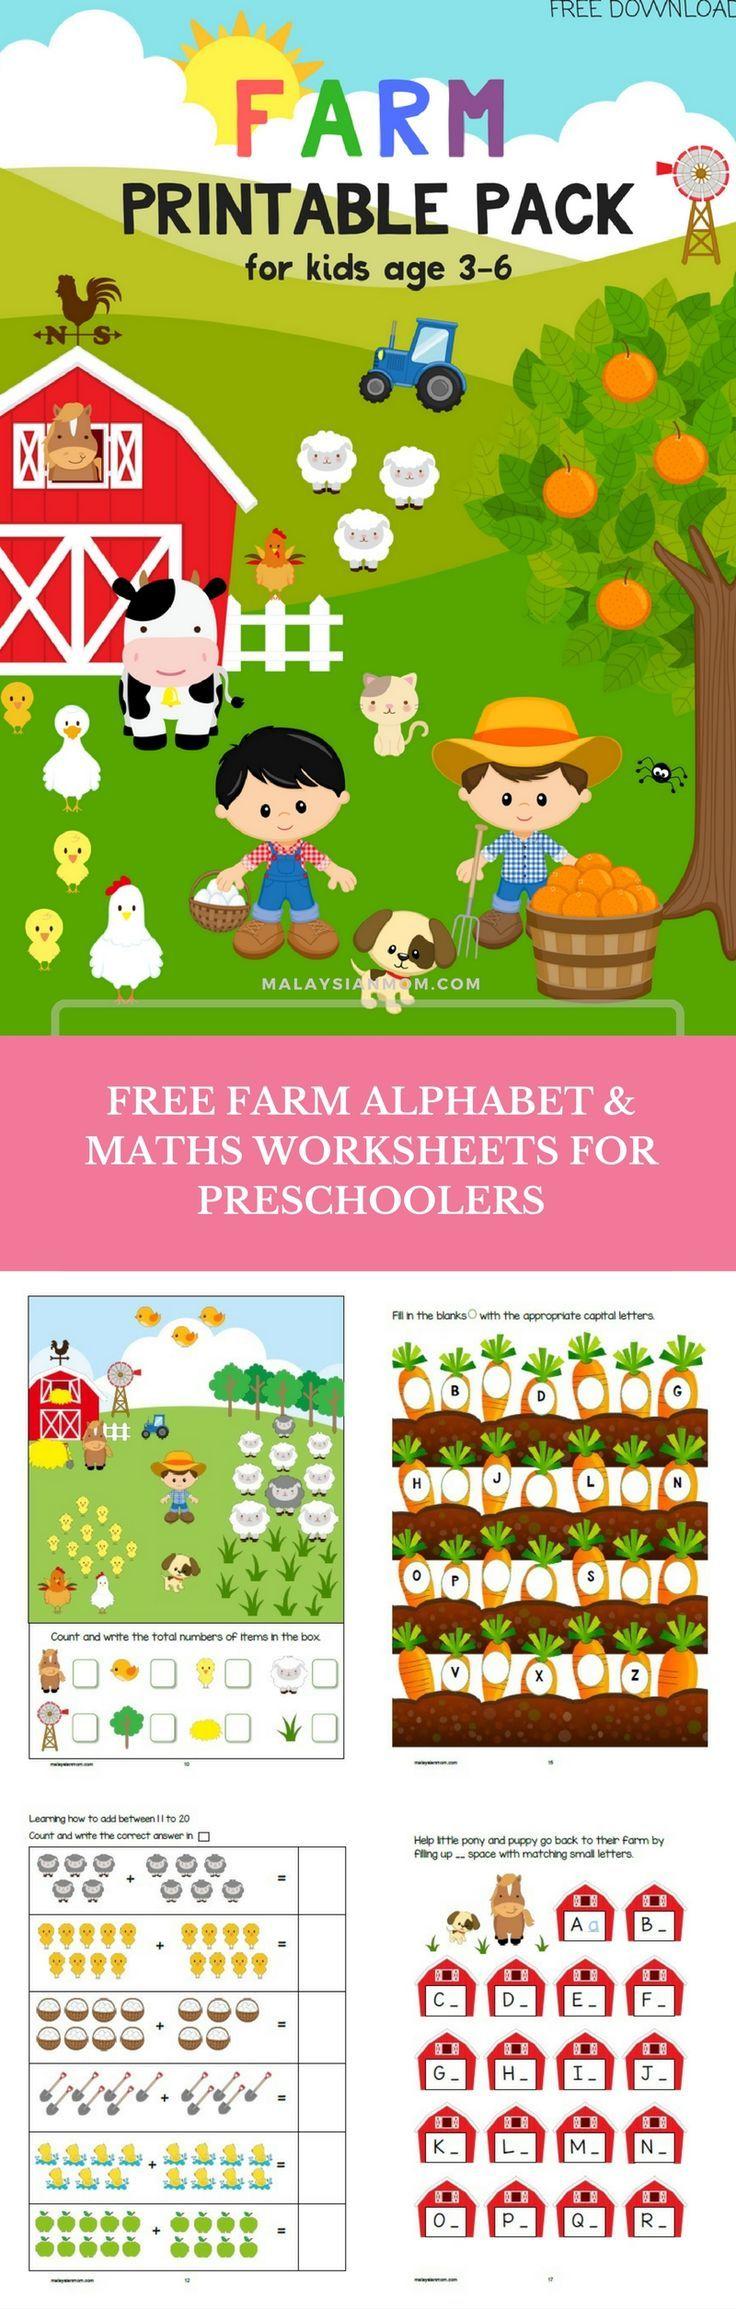 FARM PRINTABLE PACK | Kinderspiele, Vorschule und Mathe